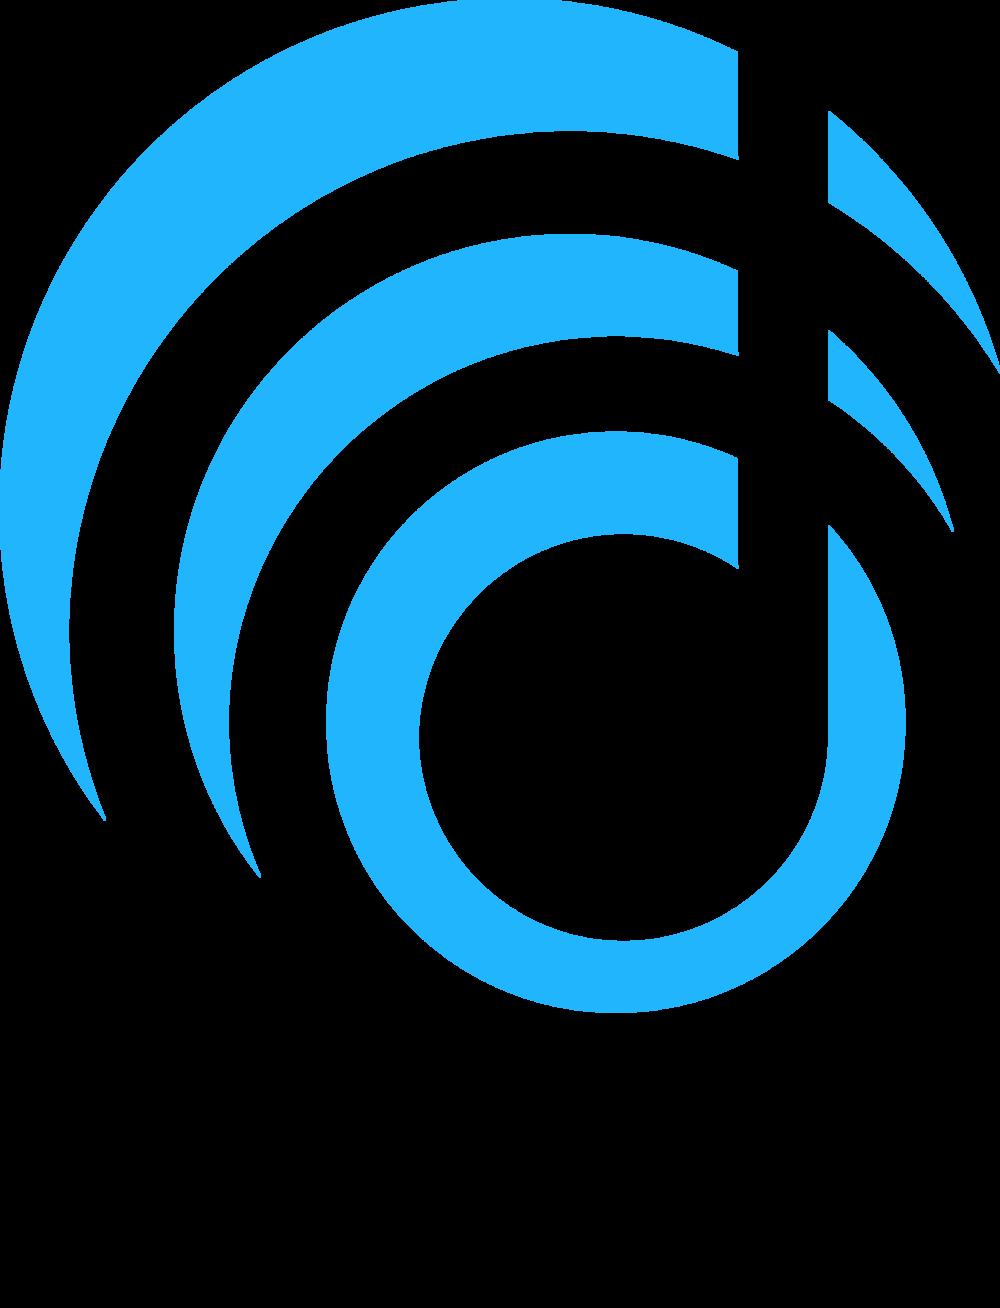 enote logo.png